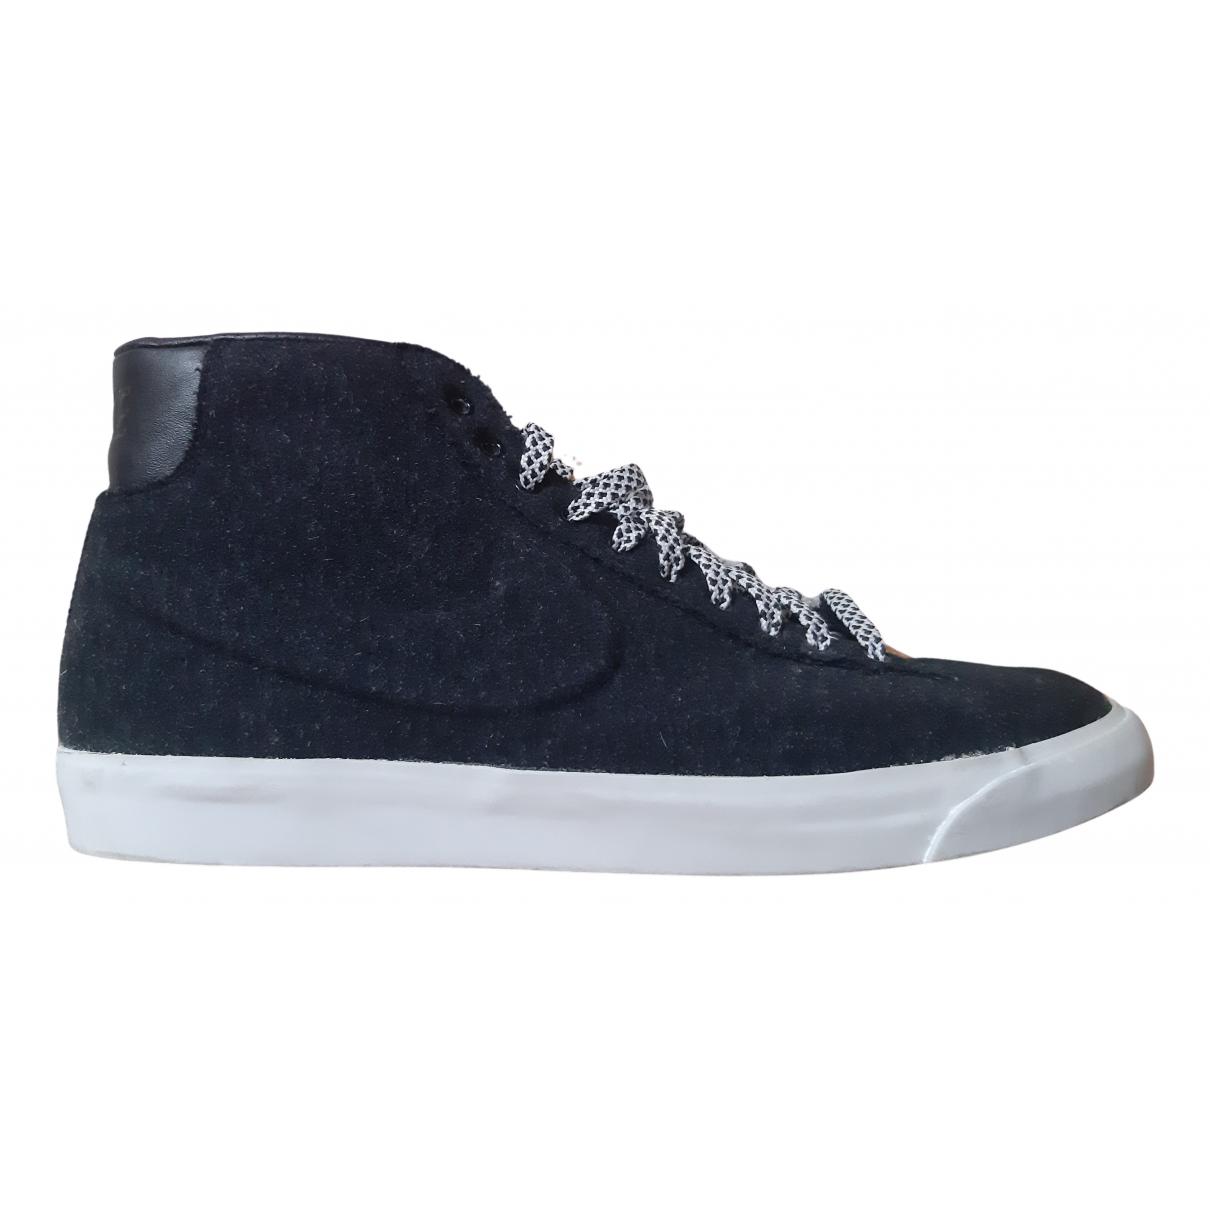 Nike Blazer Sneakers in  Anthrazit Leder